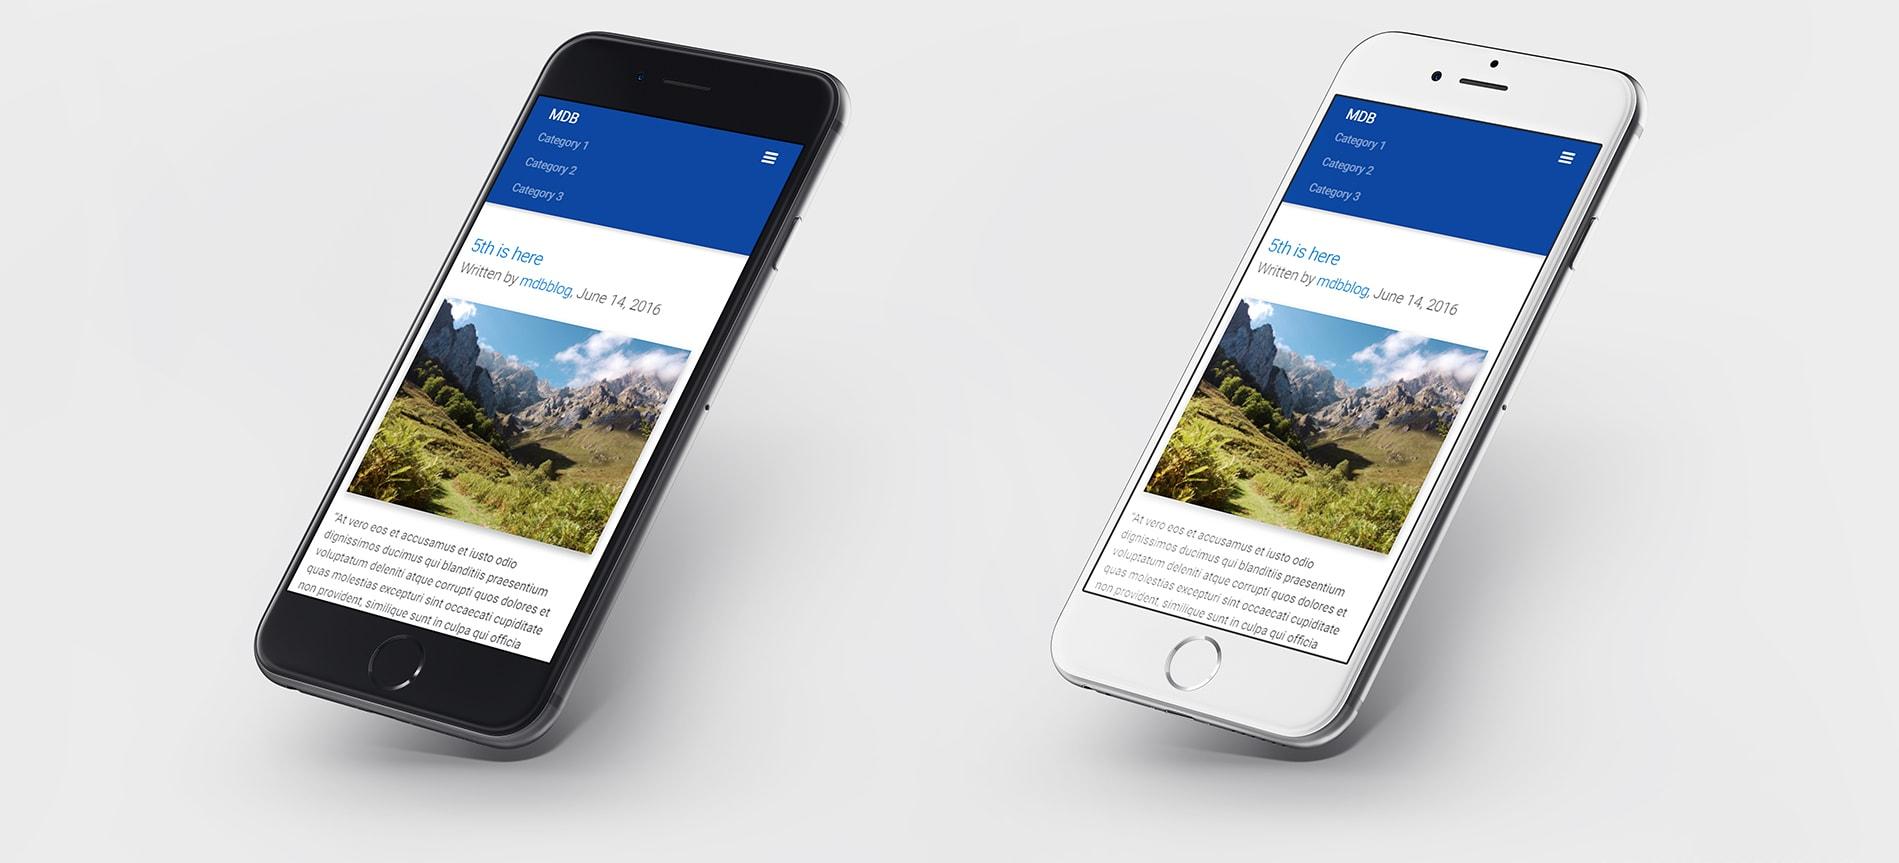 MDB website displayed on iPhones